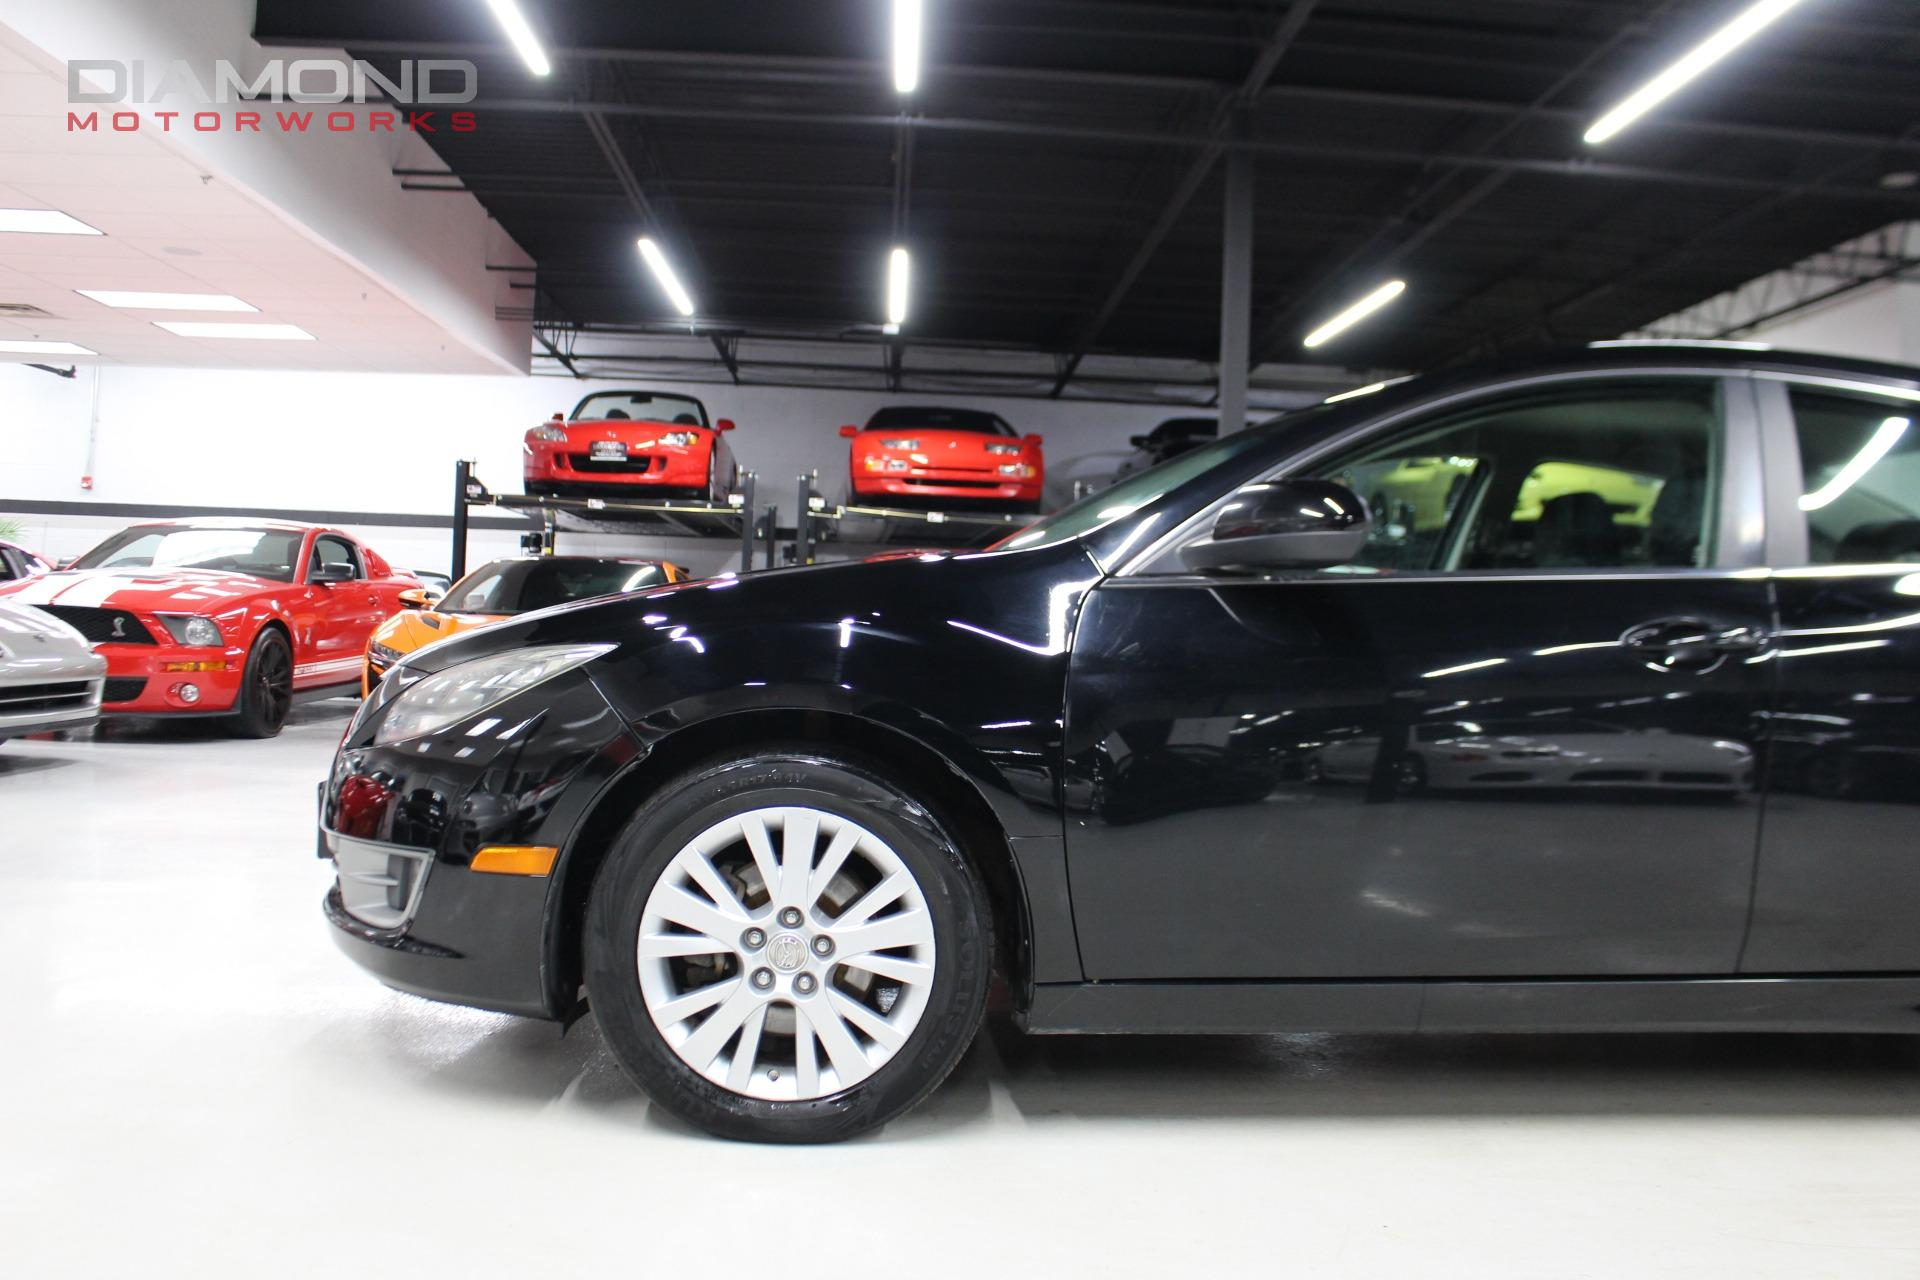 Used-2009-Mazda-Mazda6-i-Touring